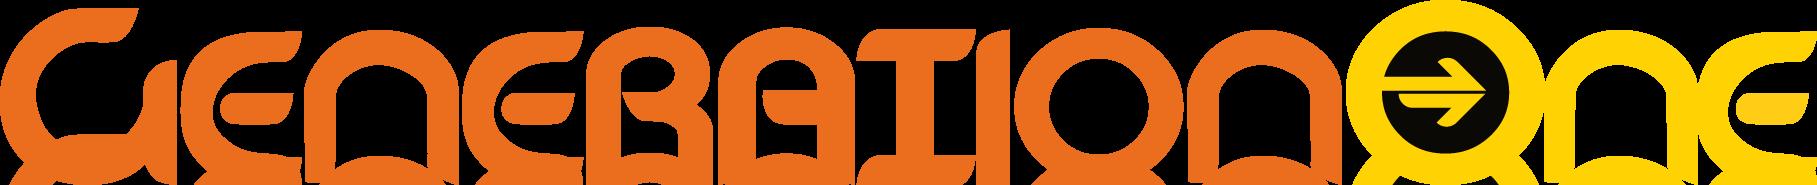 GenerationOne_logo.png